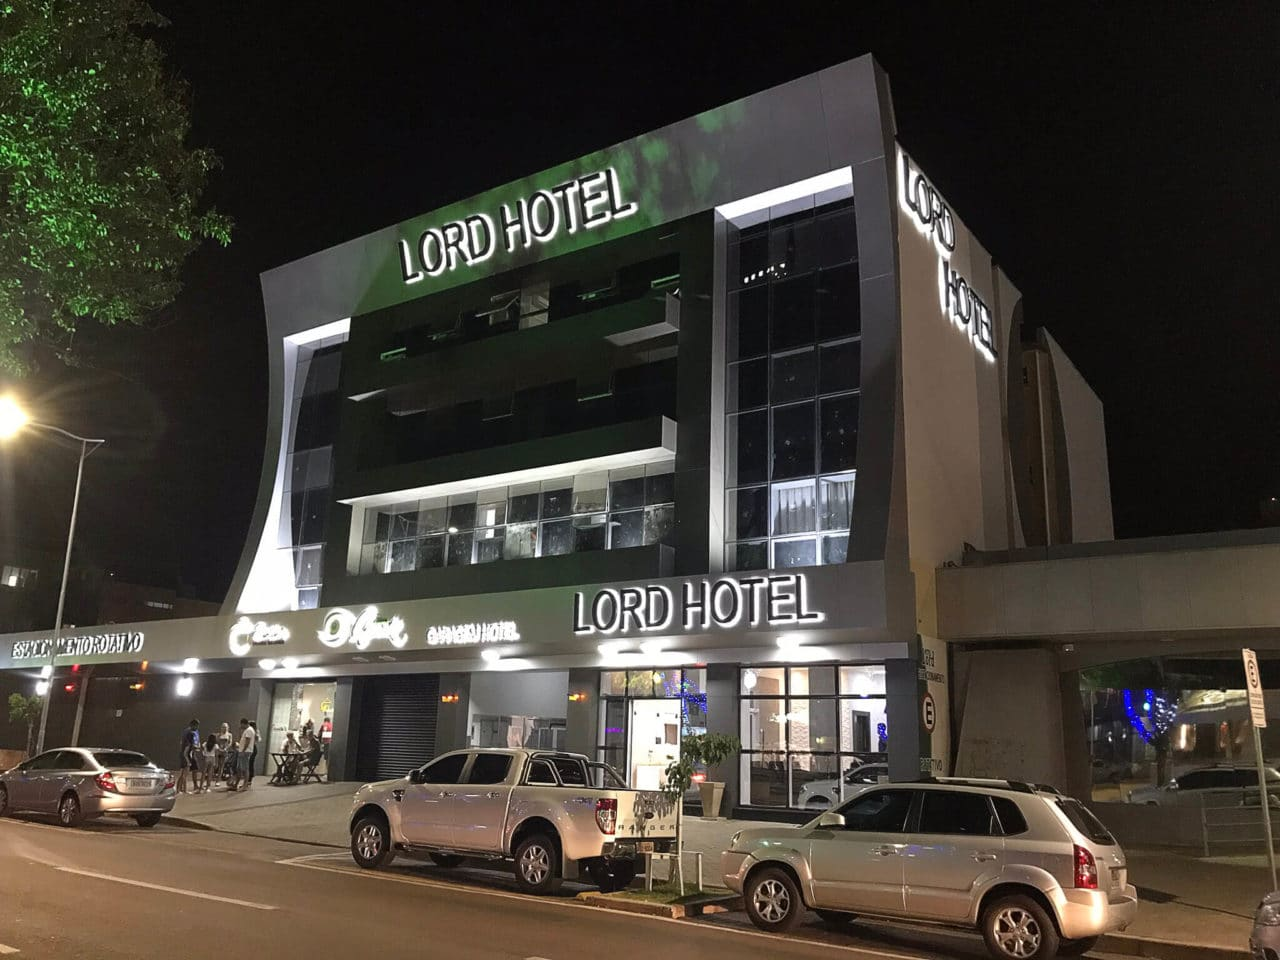 Lord Hotel - Cascavel/PR